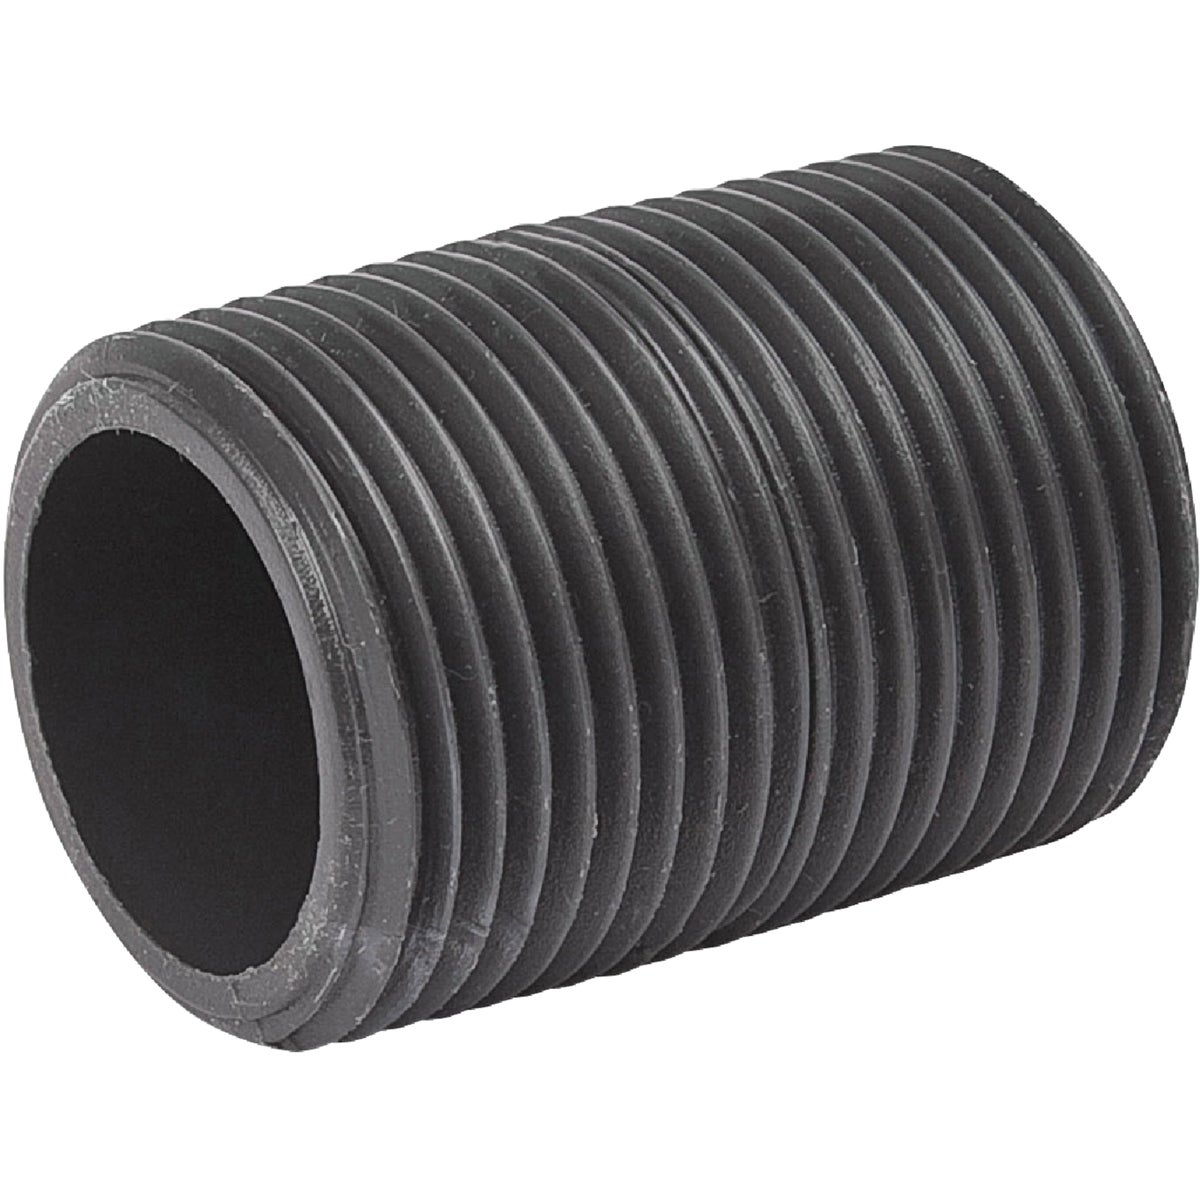 1/2XCL PVC NIPPLE